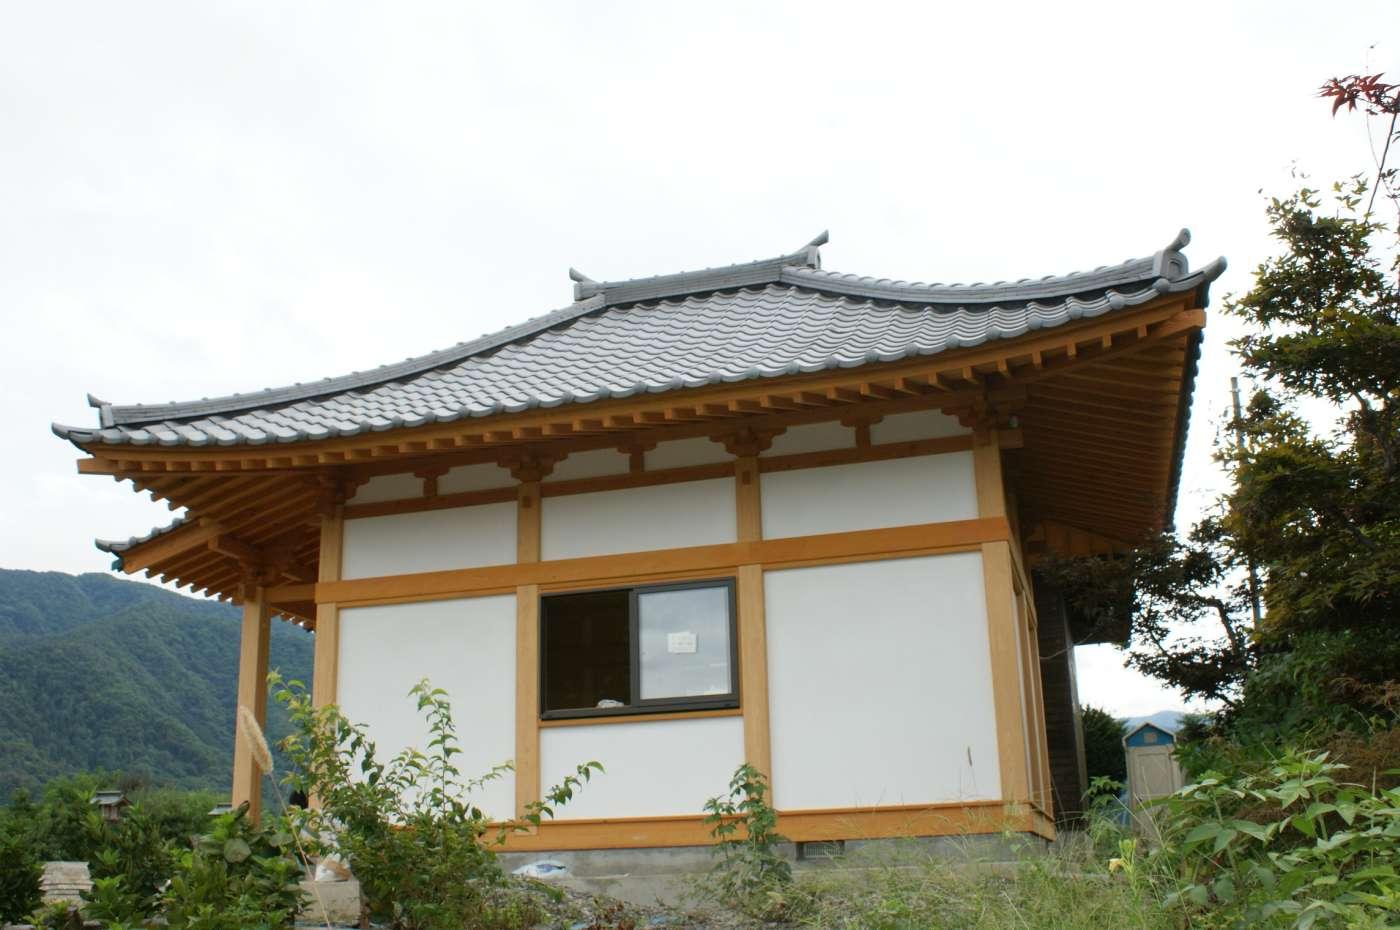 http://sumainomatsuki.com/folder1/DSC04899.JPG